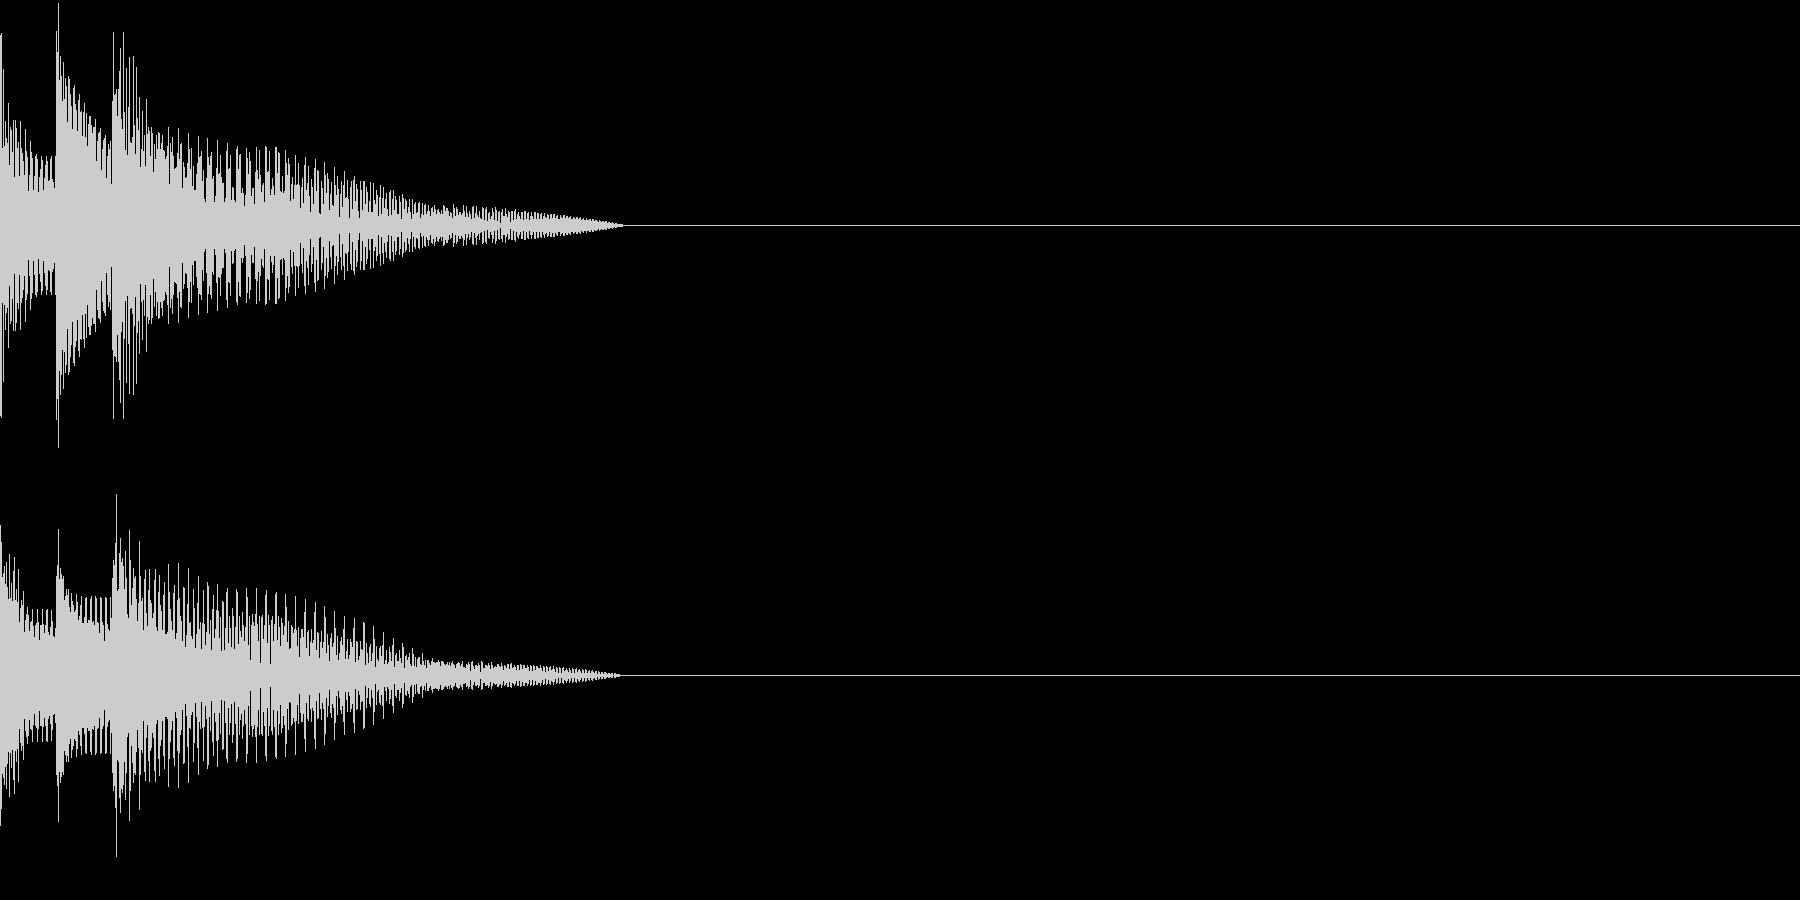 Cursor セレクト・カーソルの音11の未再生の波形